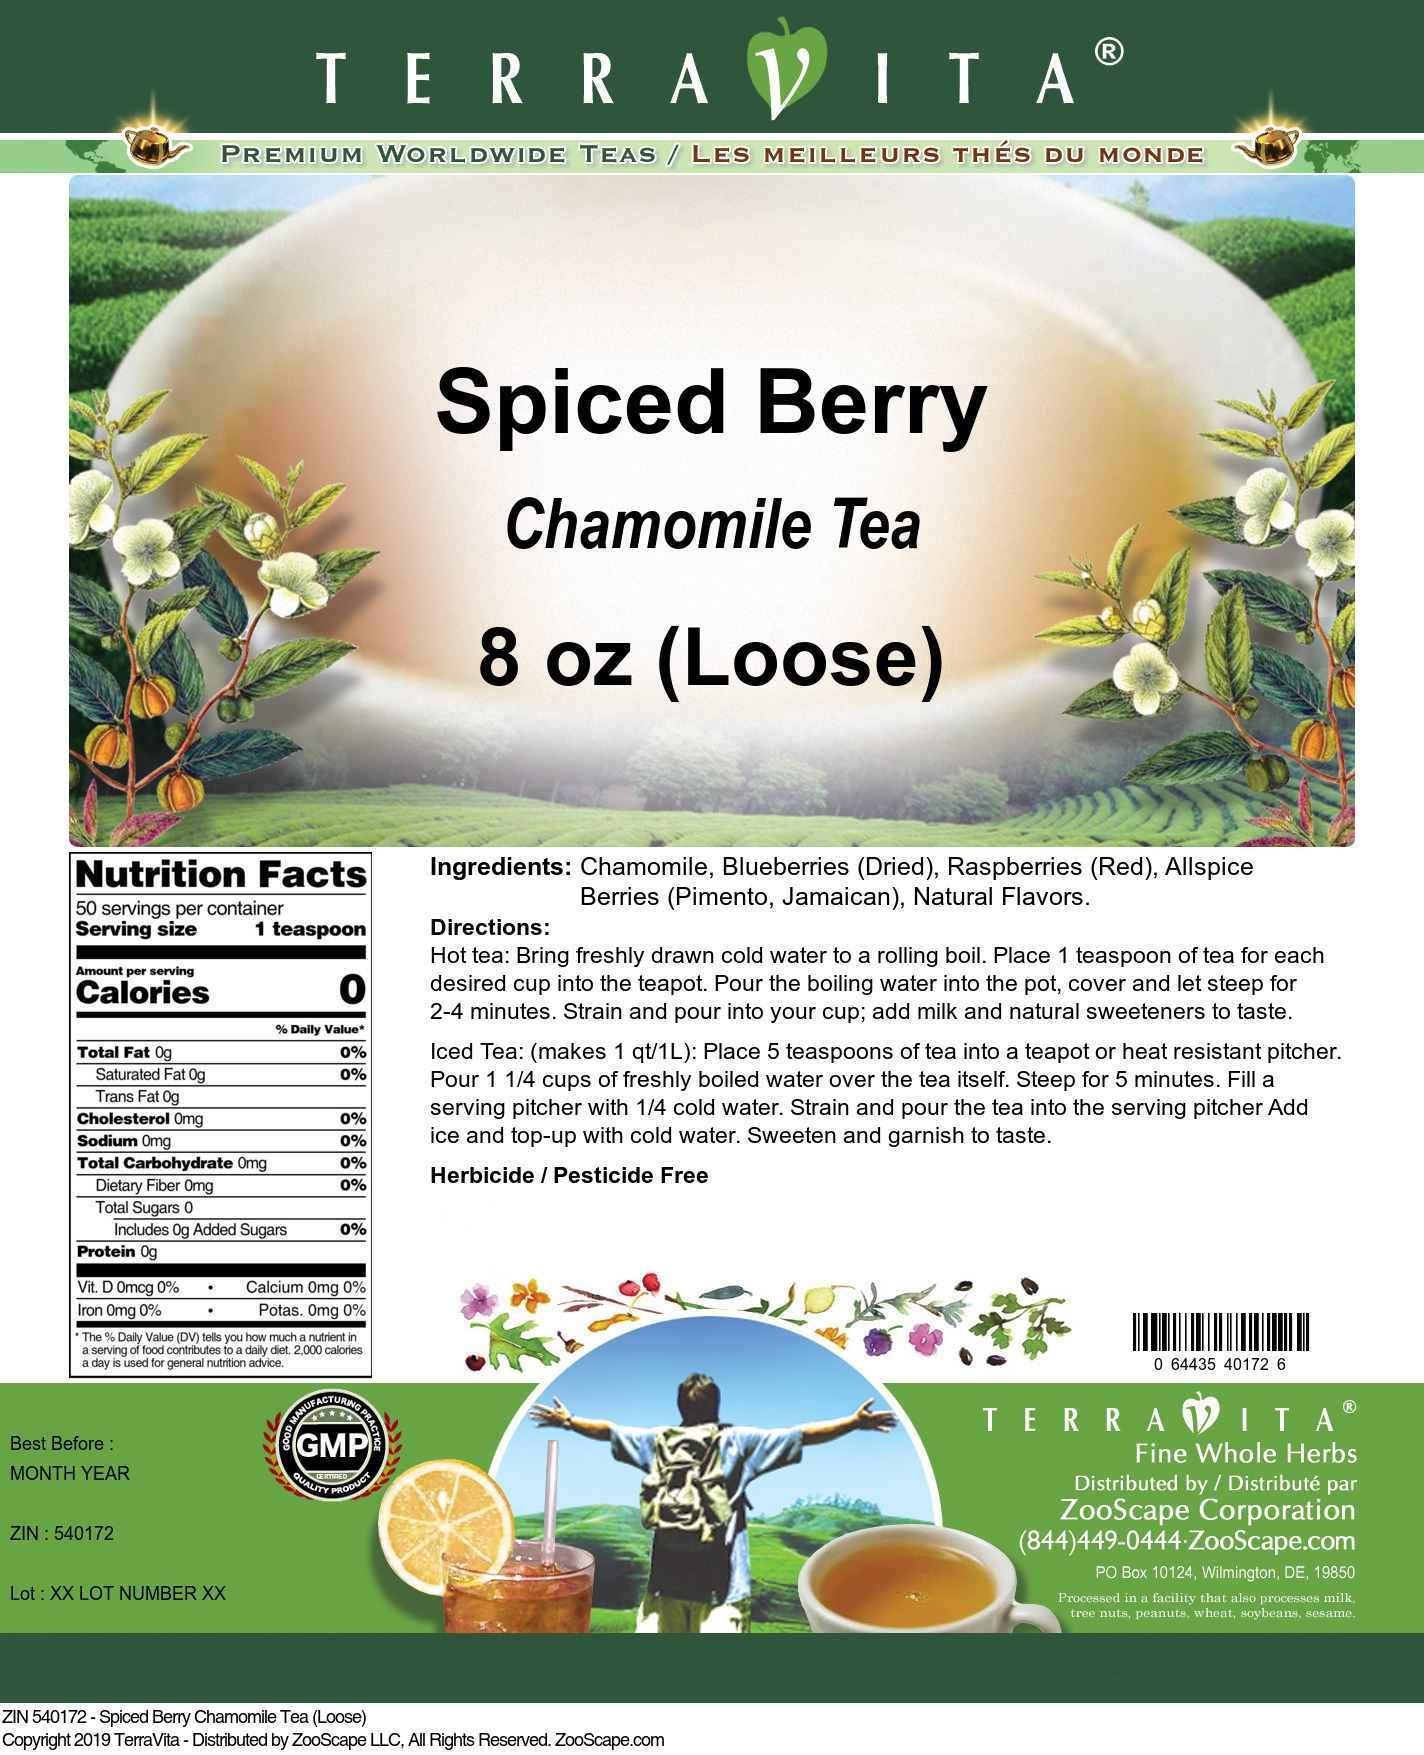 Spiced Berry Chamomile Tea